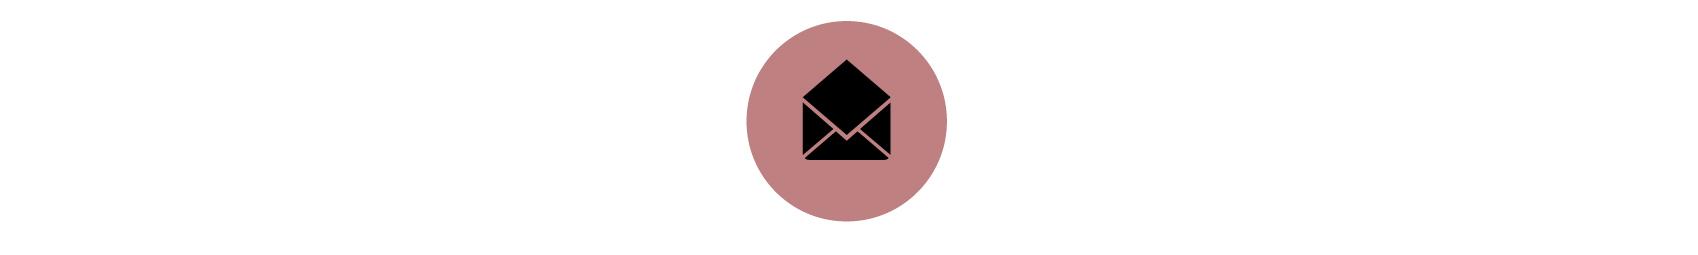 mail meer info gifts vanaf 30 euro